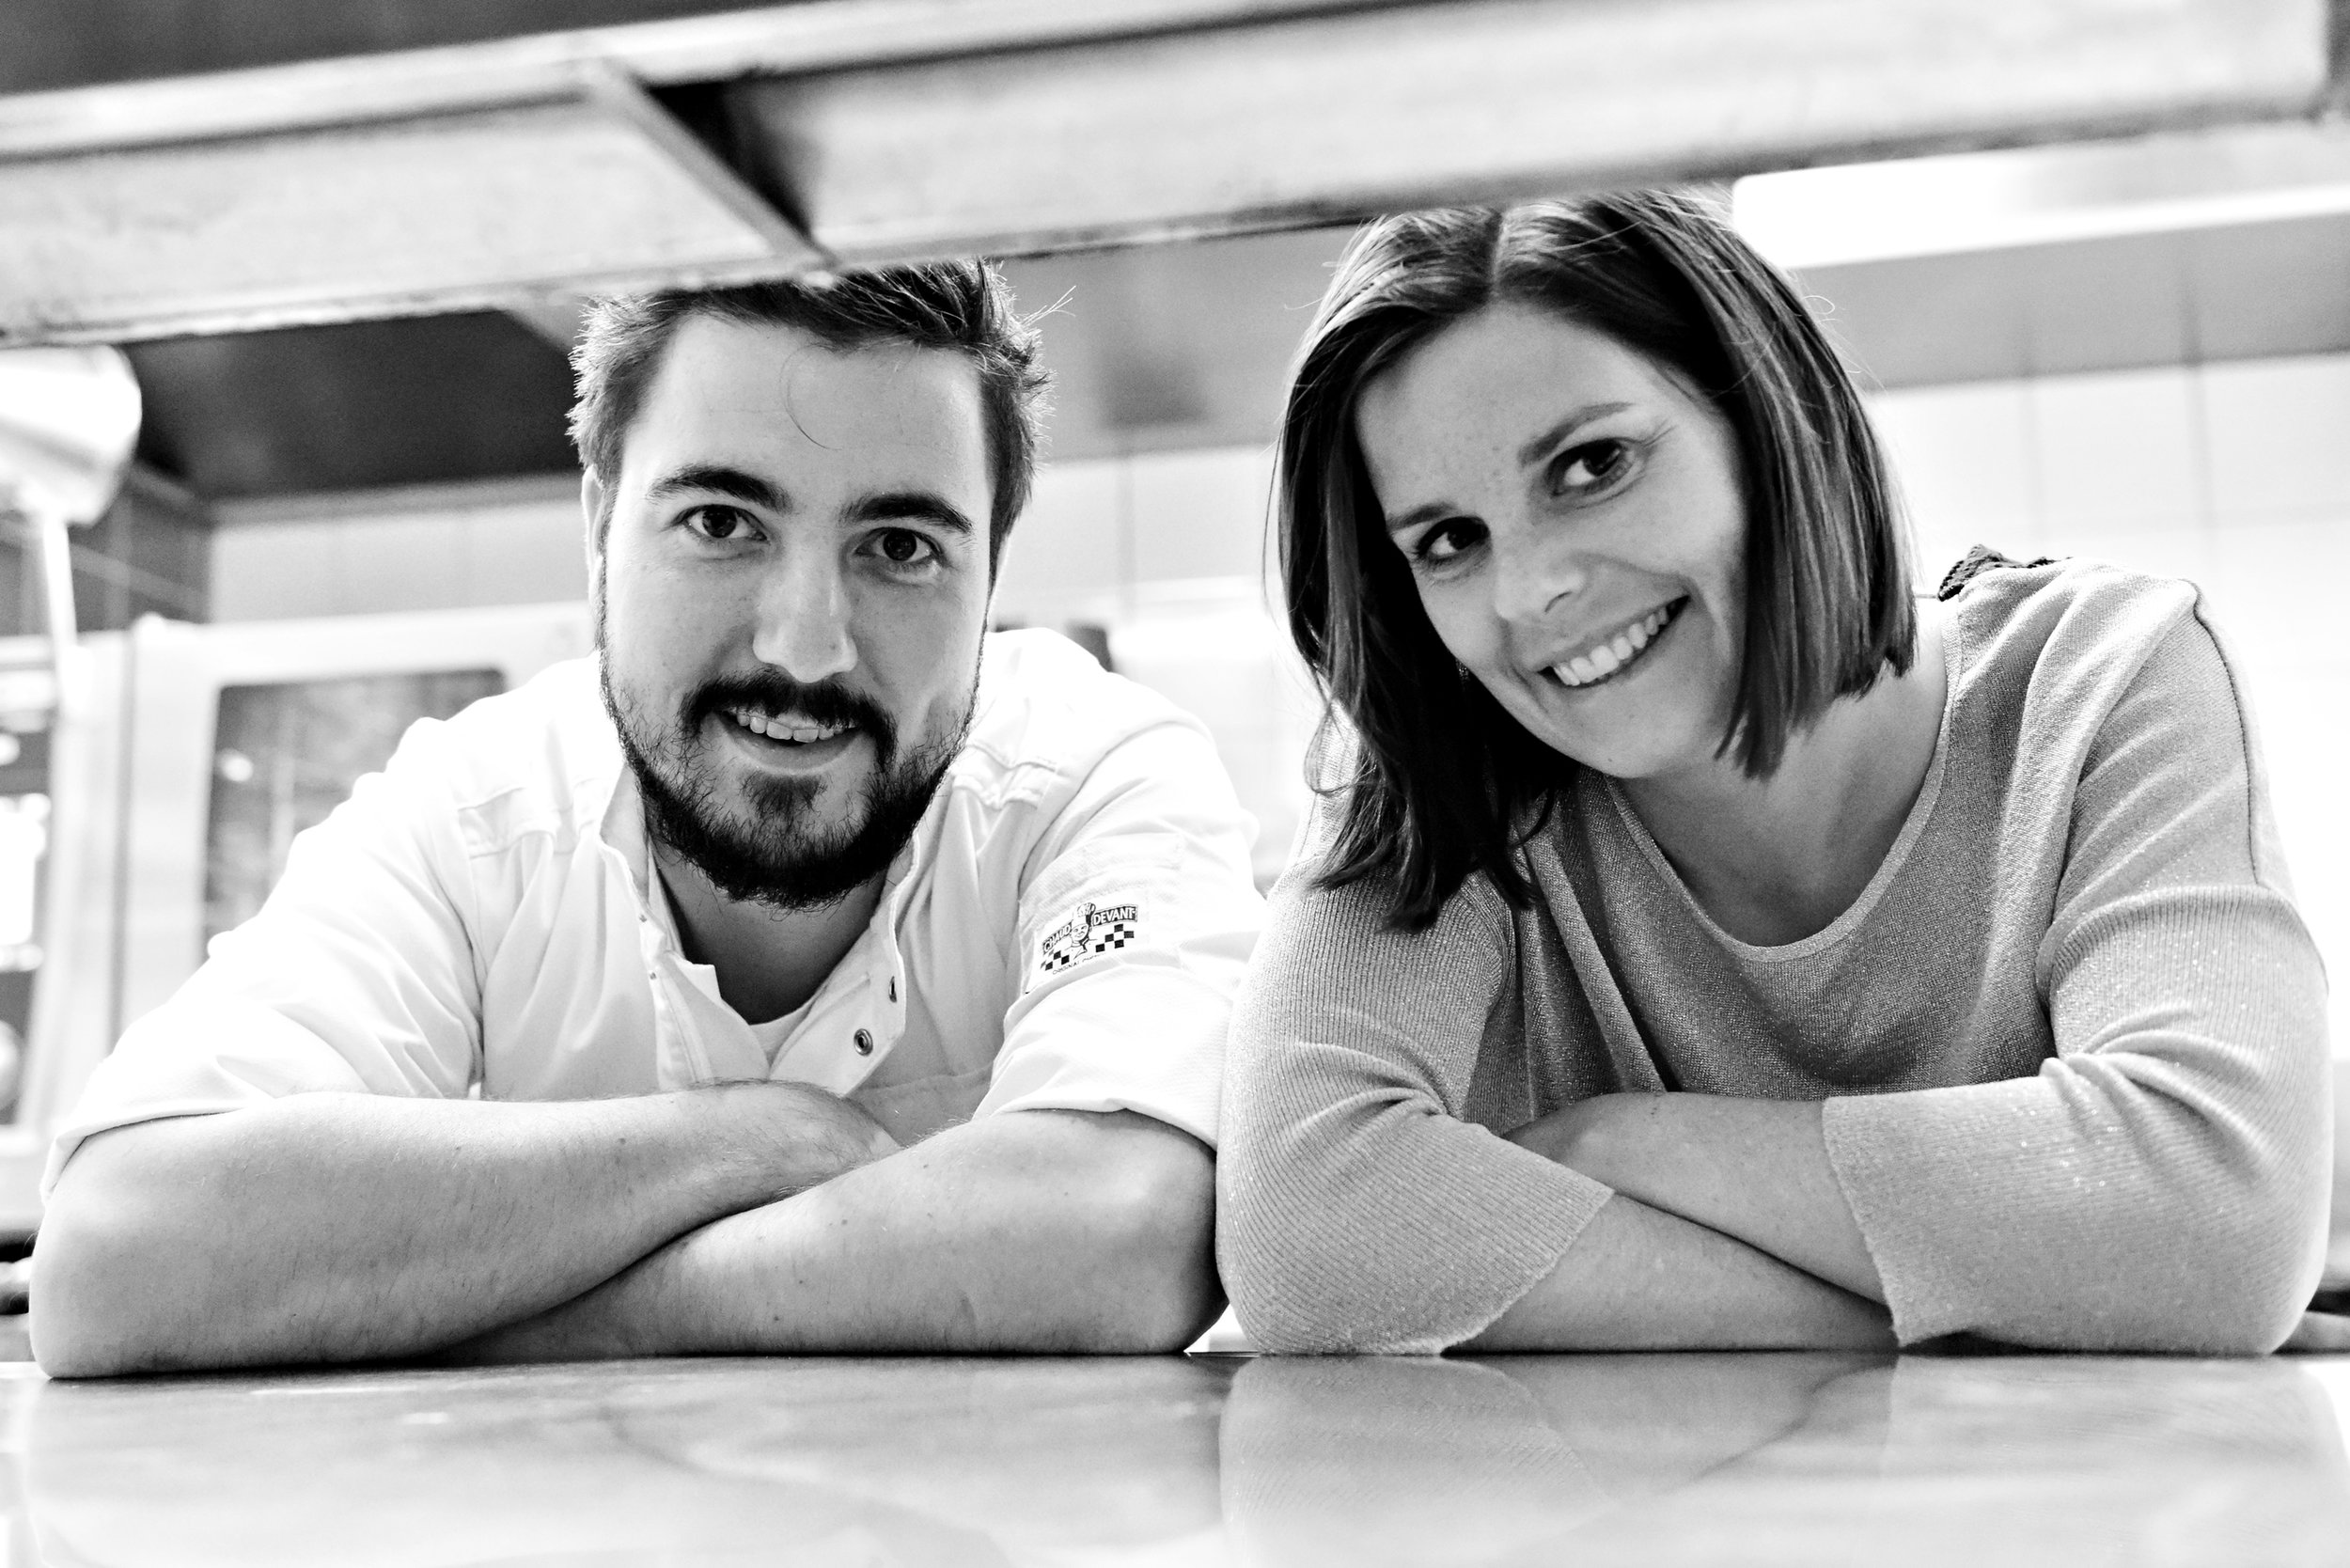 30 brasserie juste restaurant Dikkelvenne tablefever bart albrecht culinair fotograaf foodfotograaf.jpg